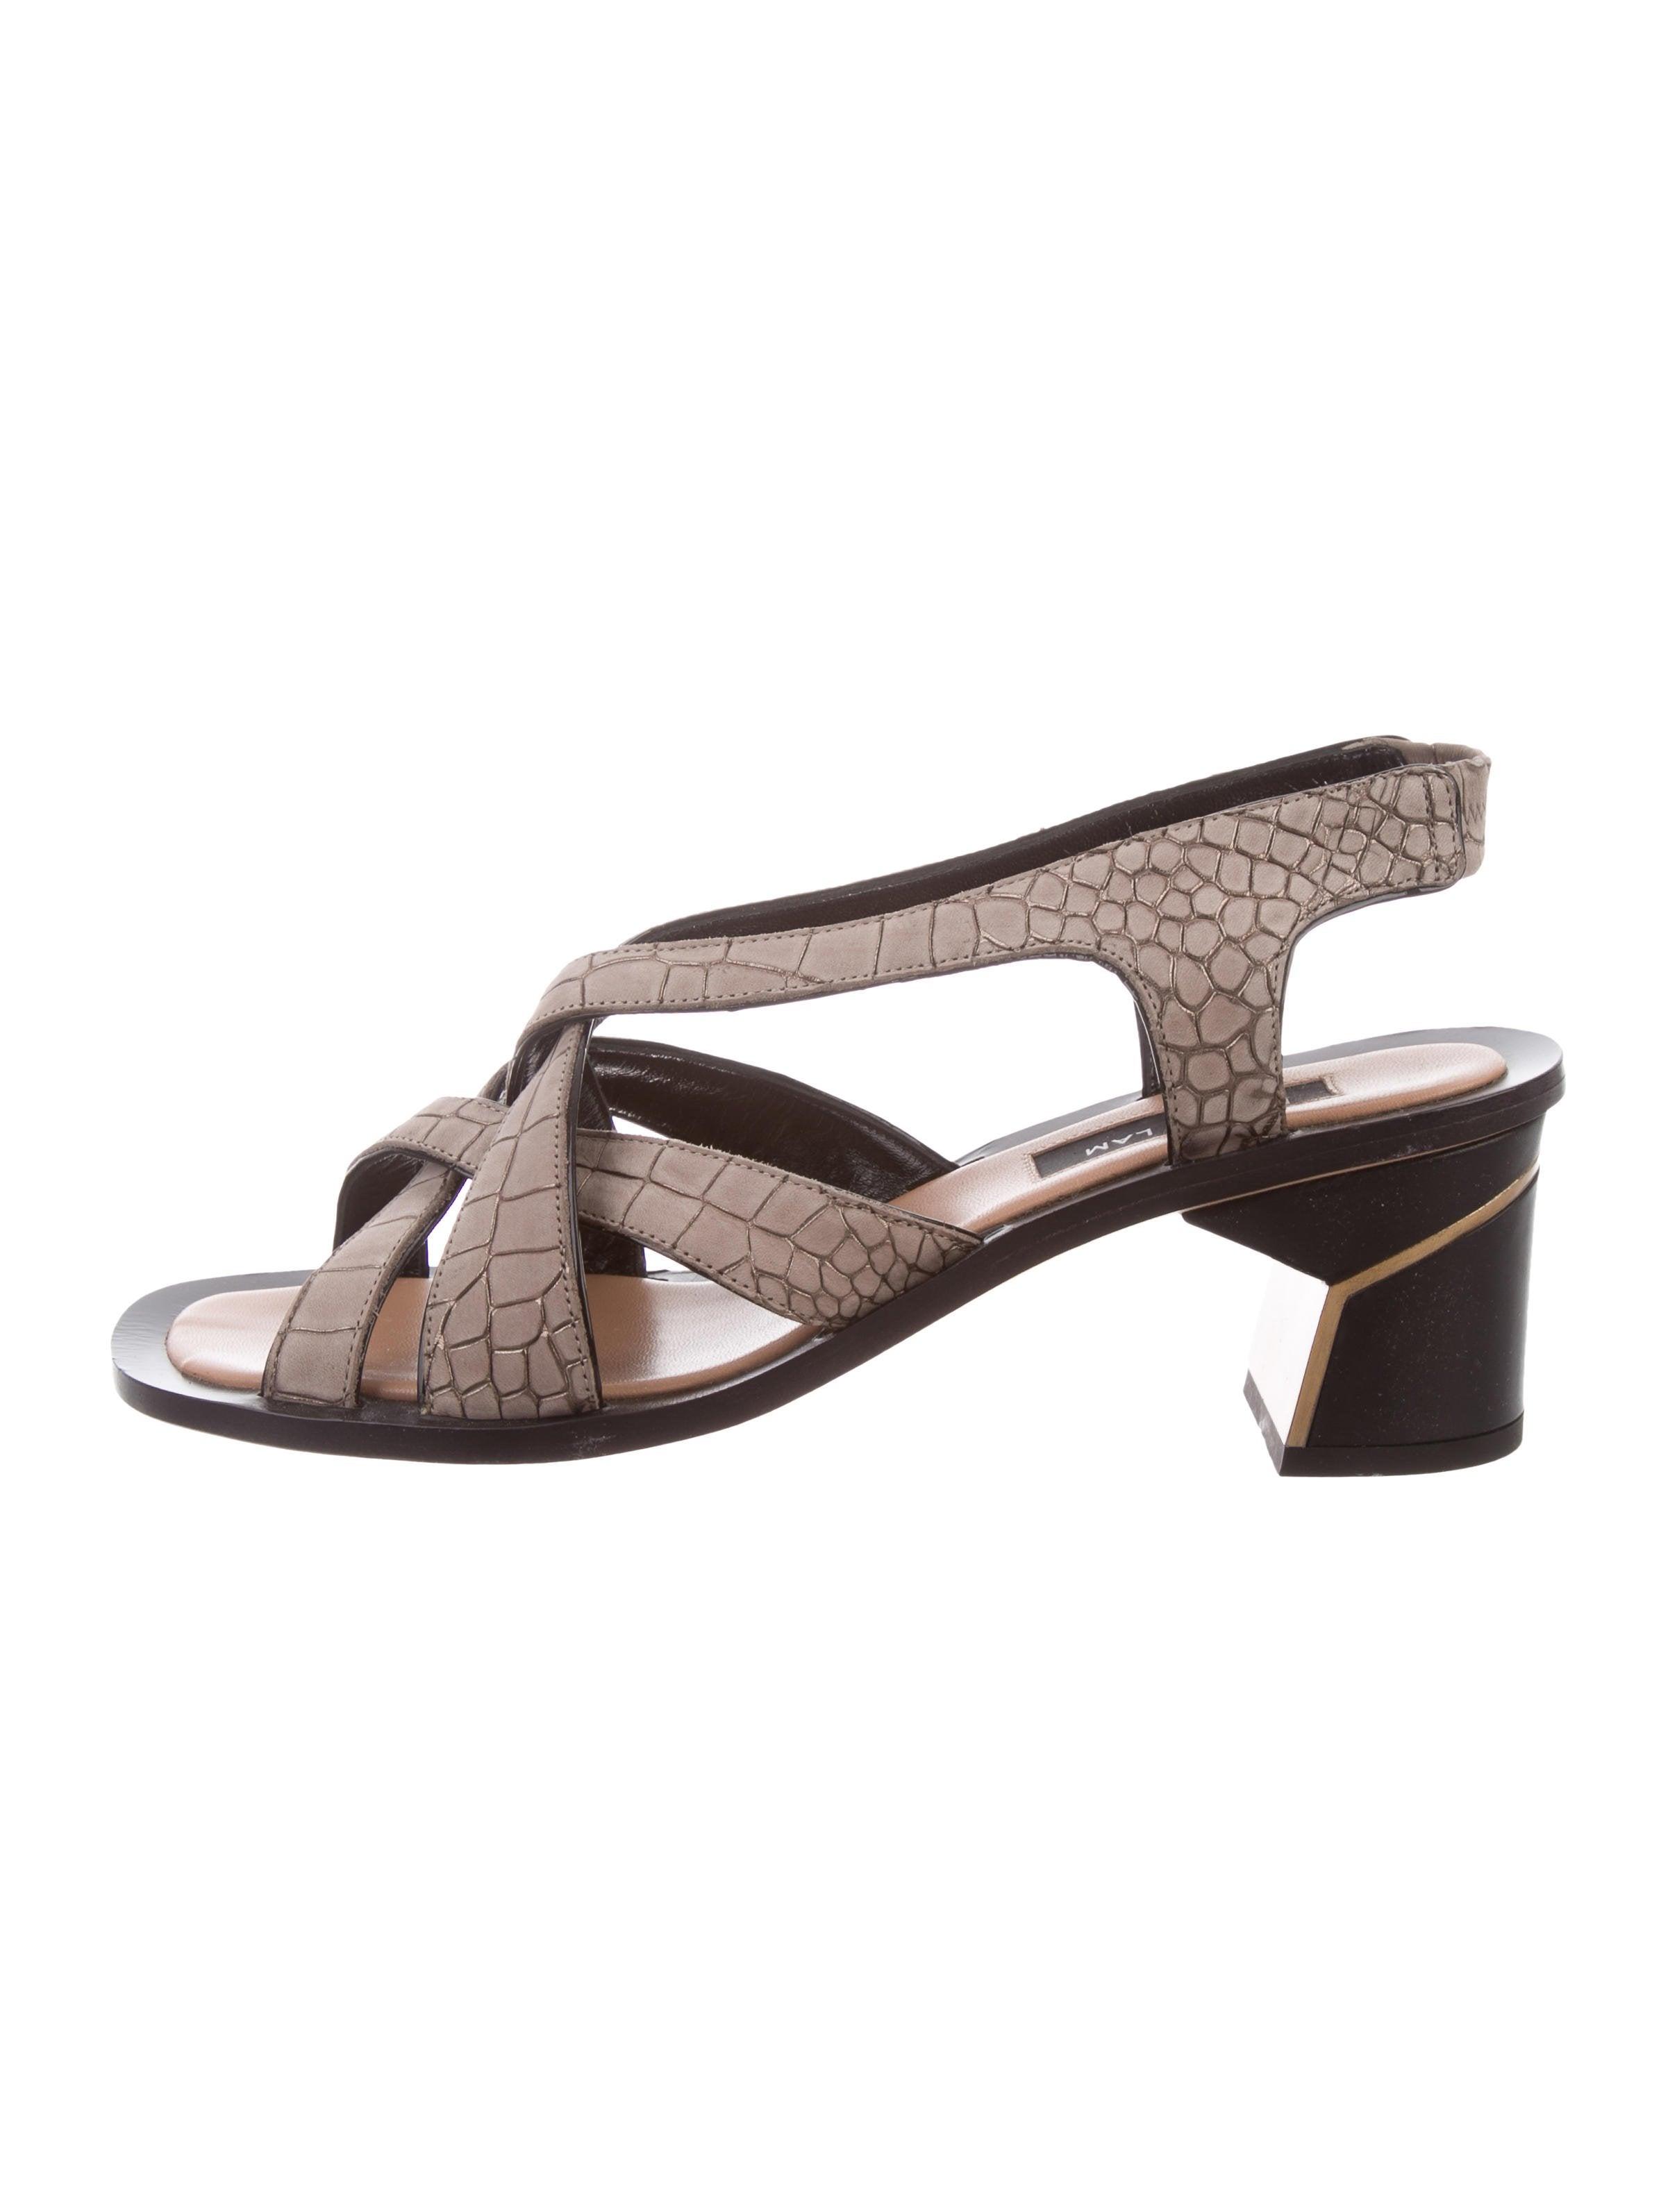 Derek Lam Embossed Suede Sandals cheap sale deals G4Zbgh